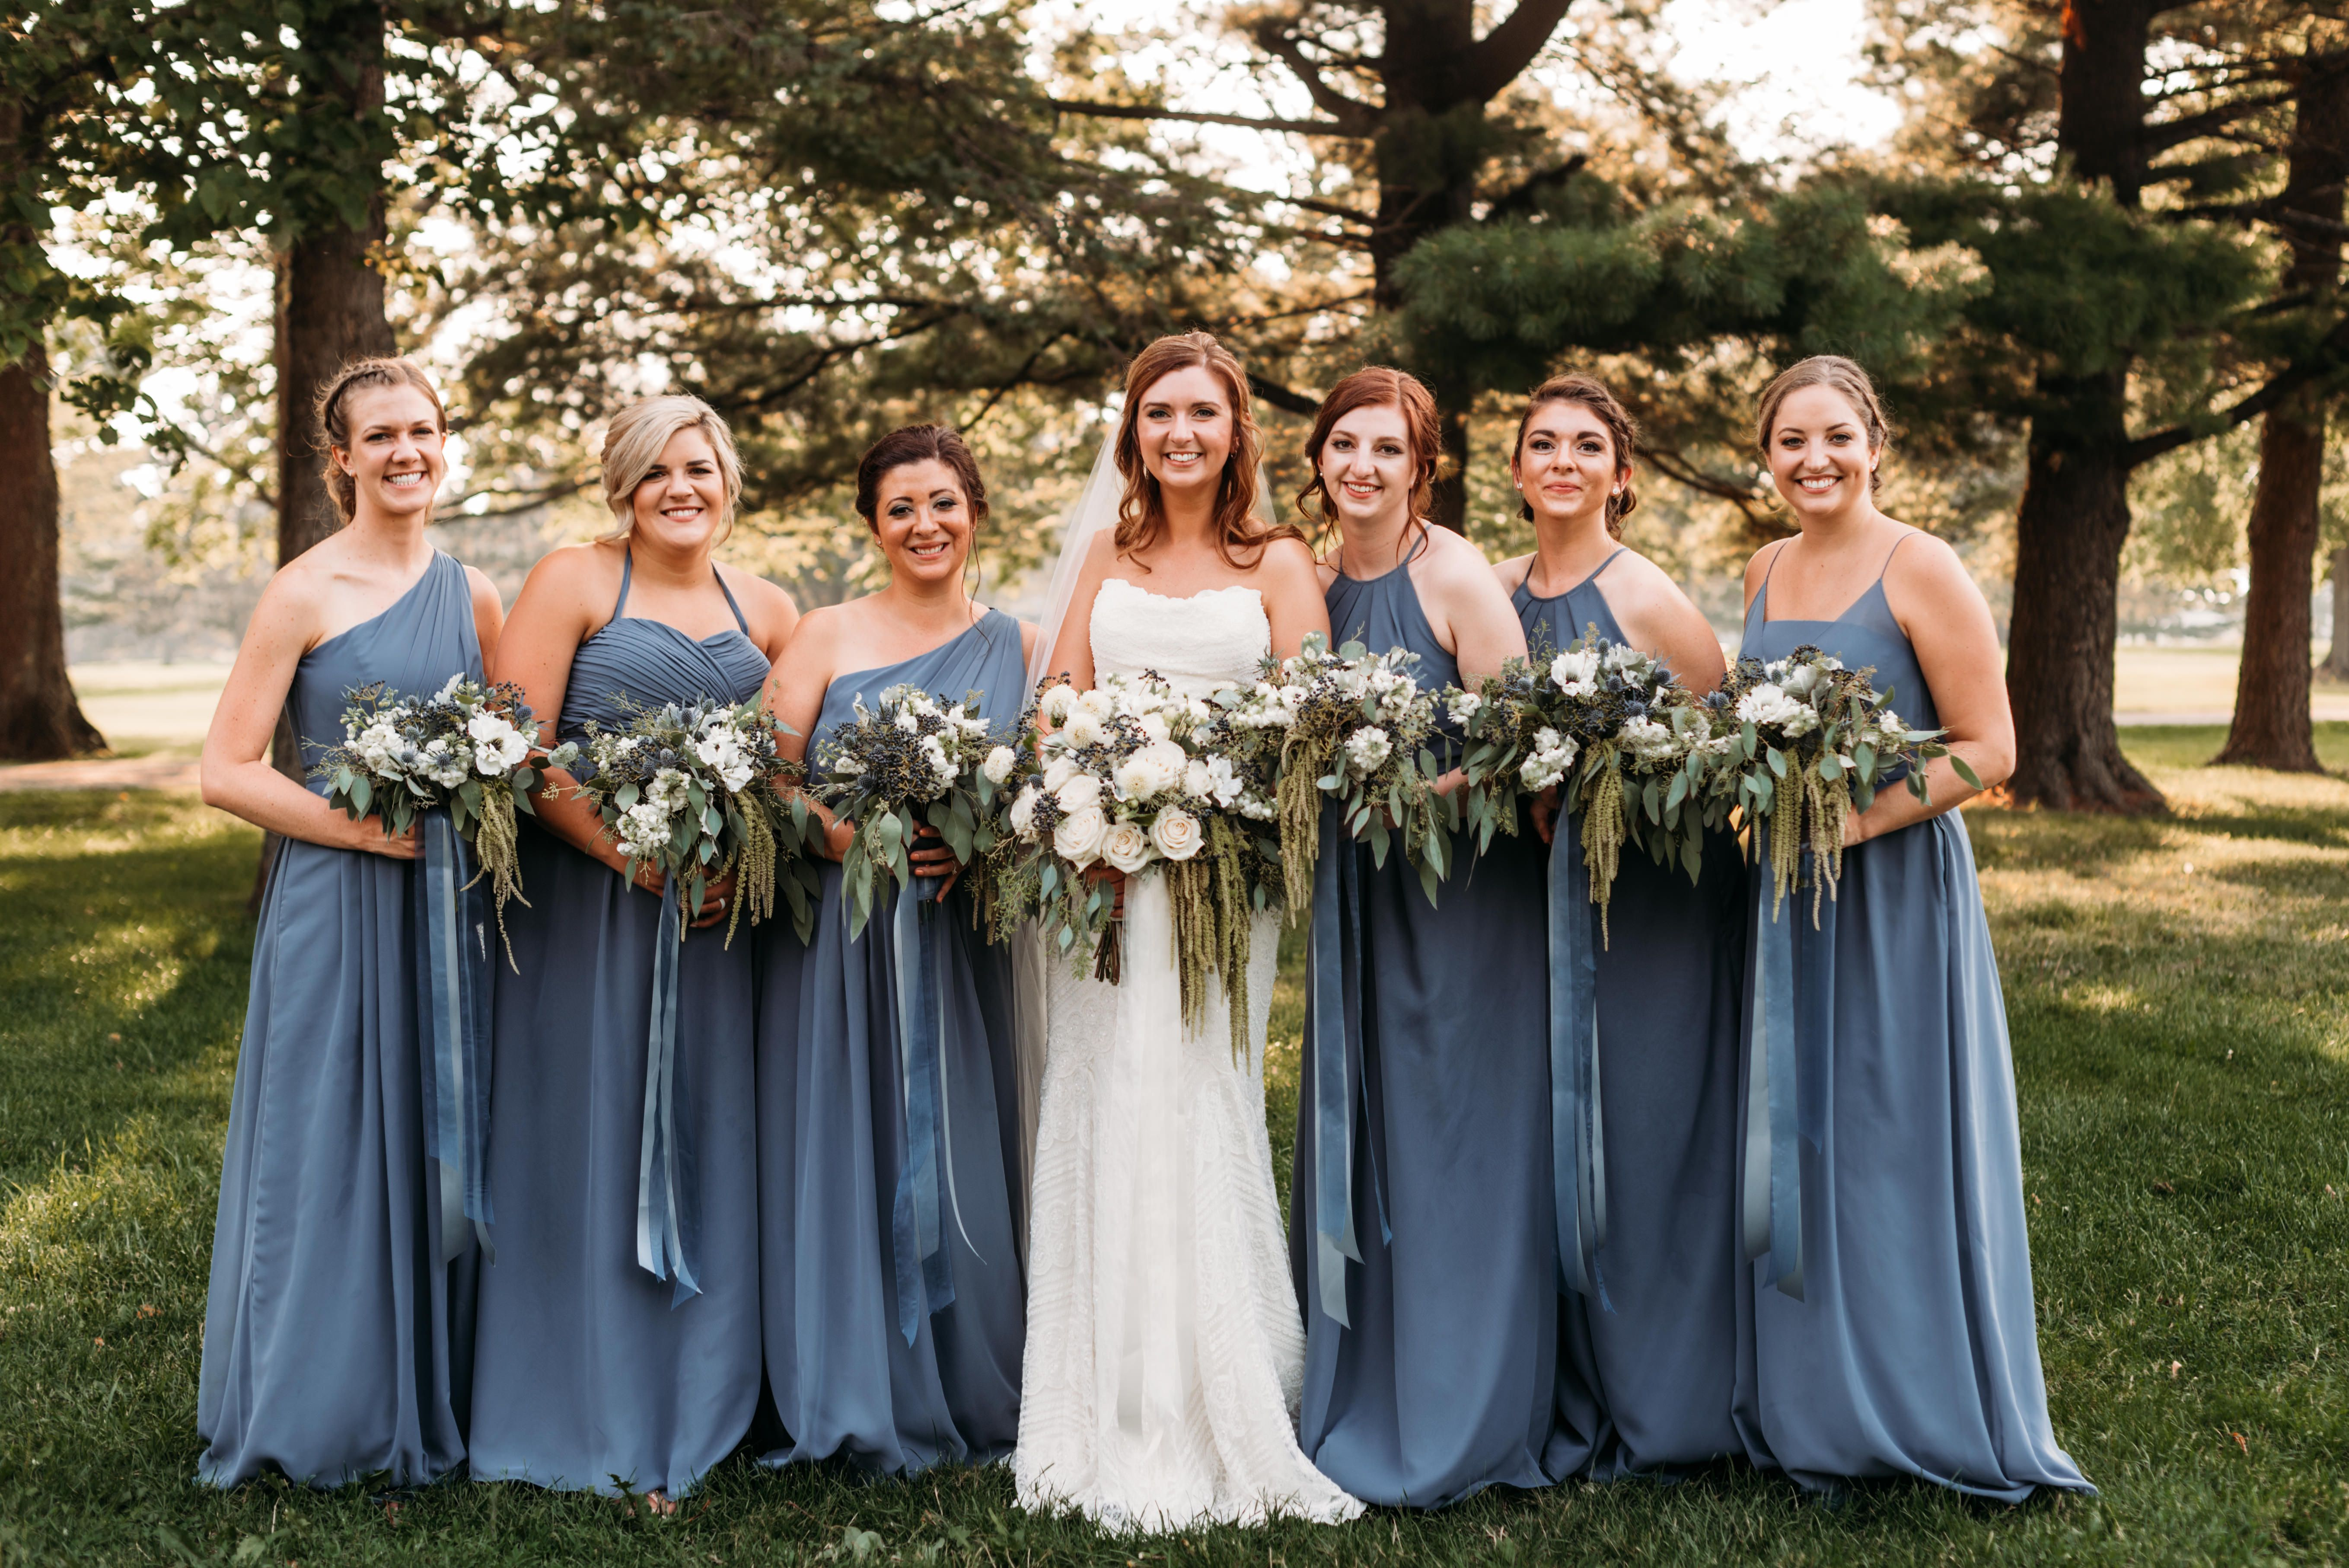 Slate Blue Dusty Blue Bridal Party Cheap Bridesmaid Dresses Uk Slate Blue Bridesmaid Dresses Slate Blue Wedding